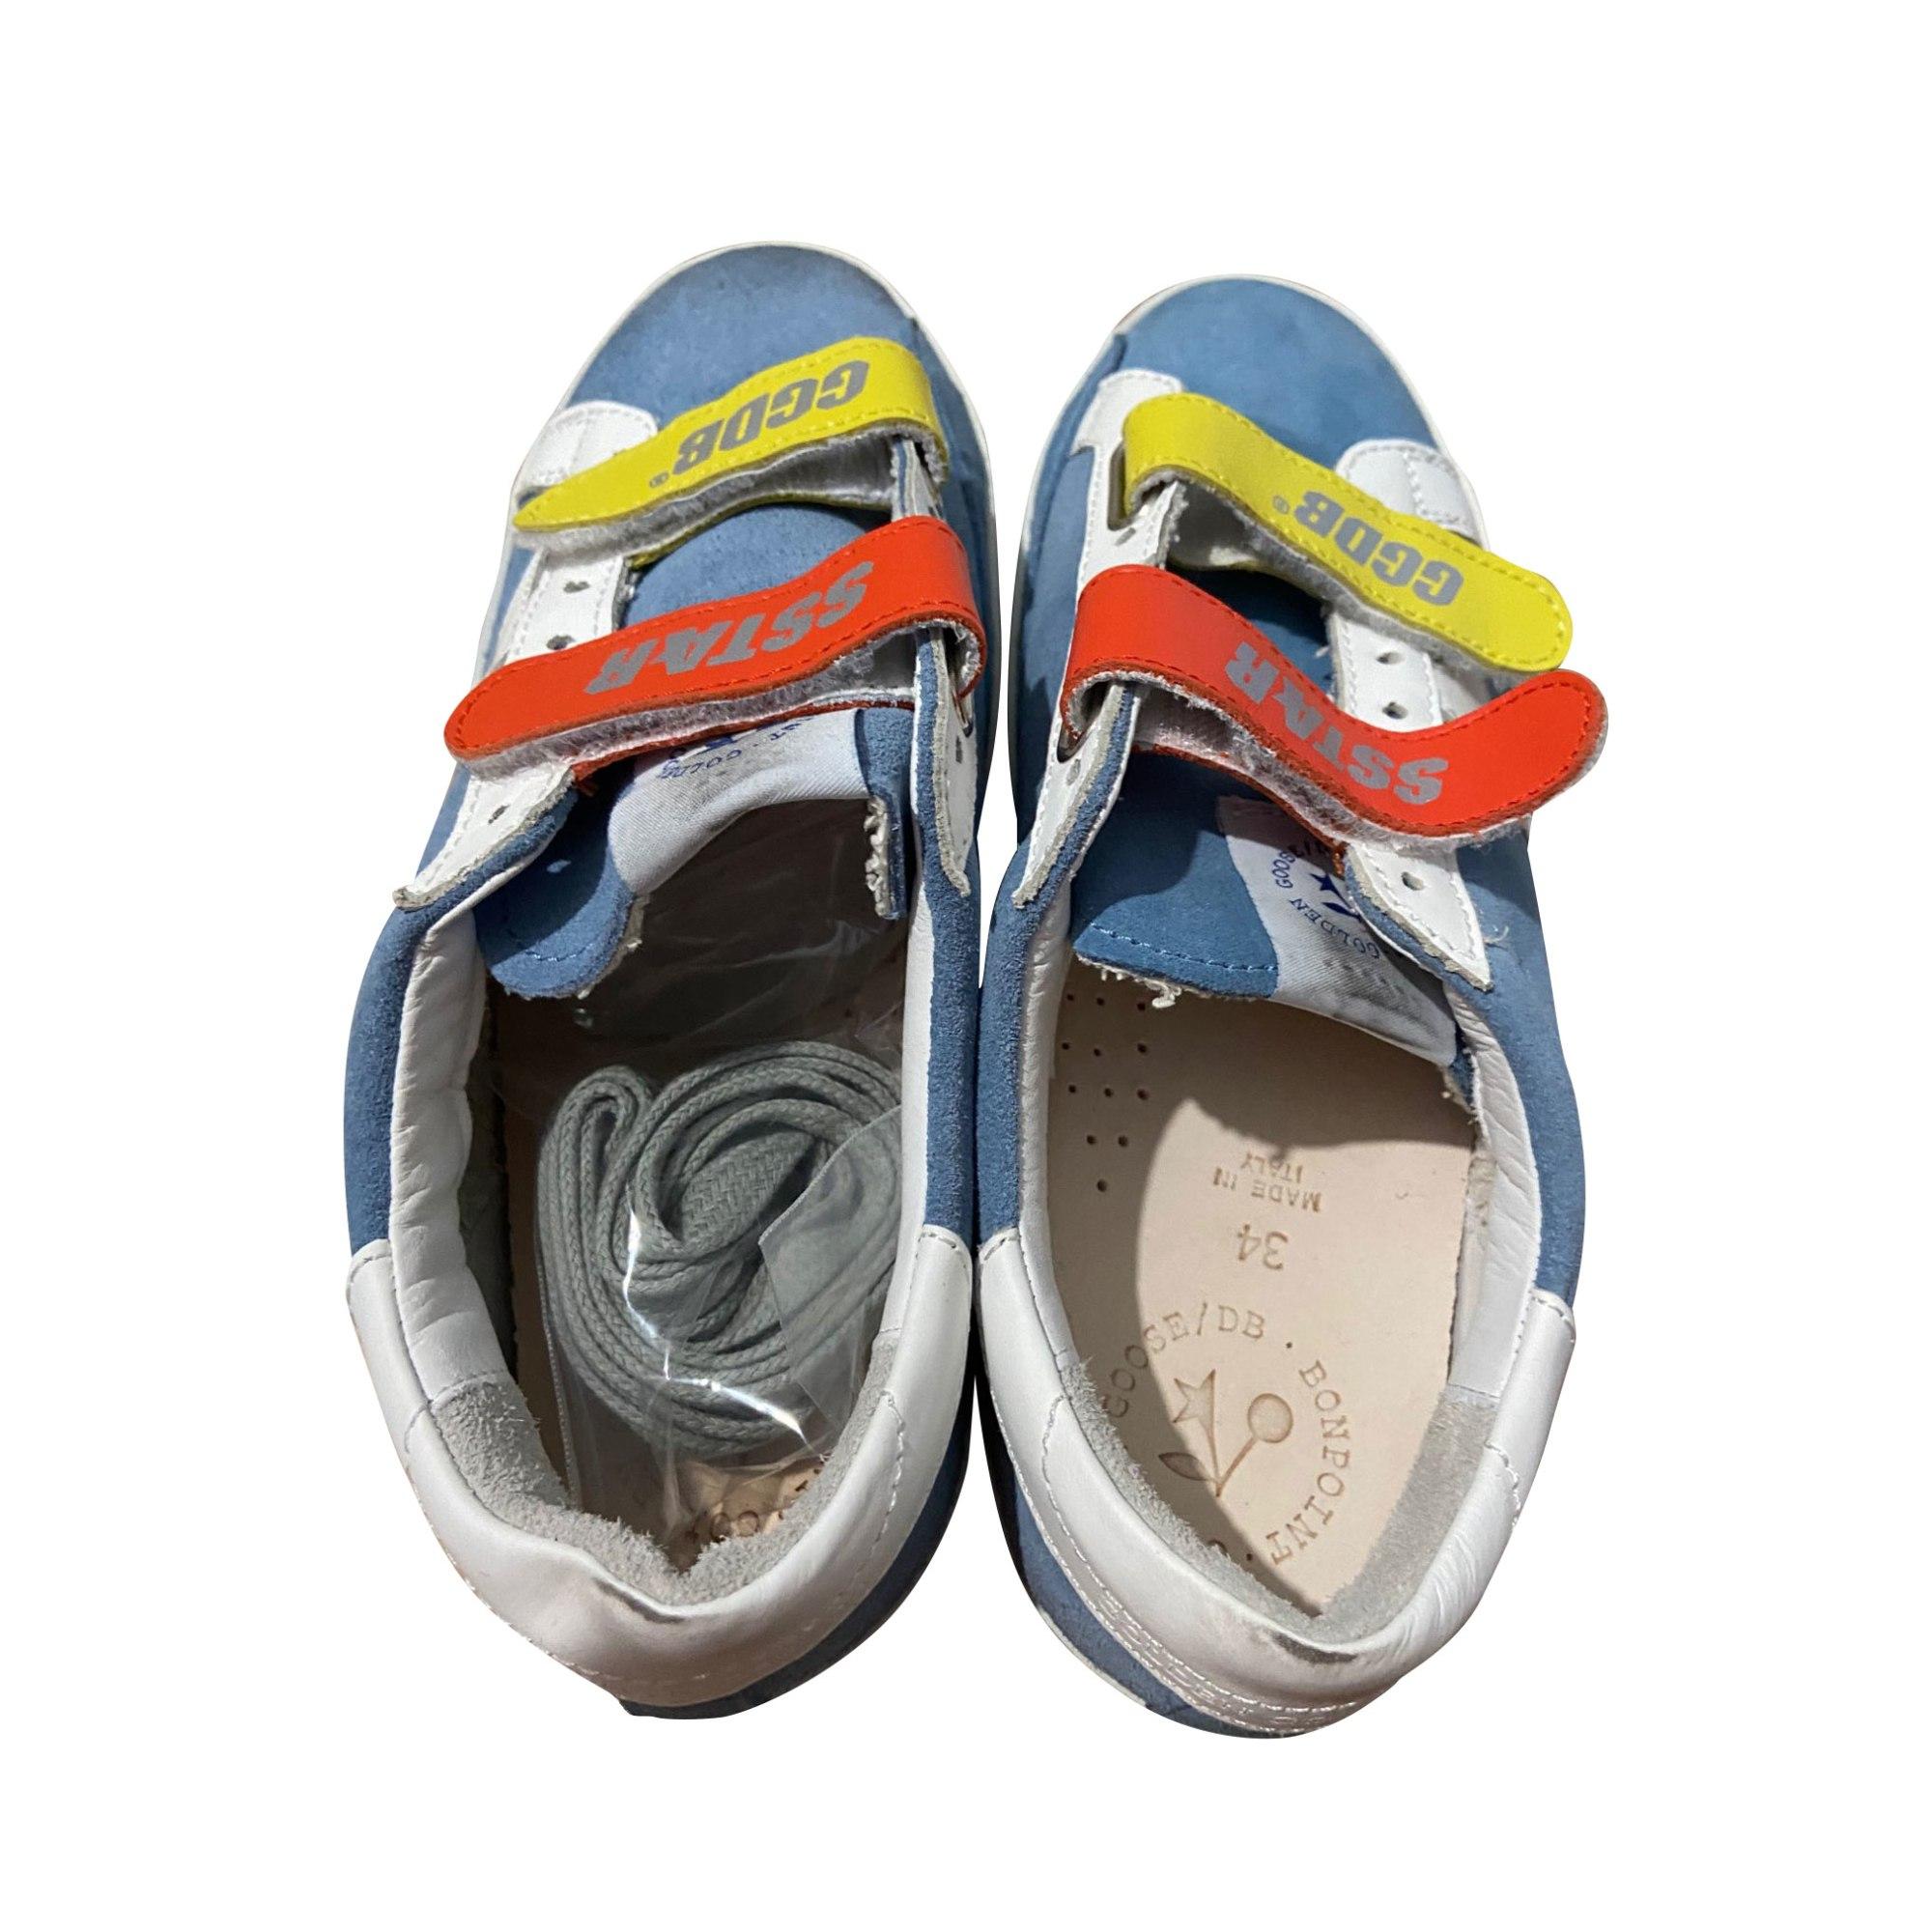 Sneakers GOLDEN GOOSE Blau, marineblau, türkisblau